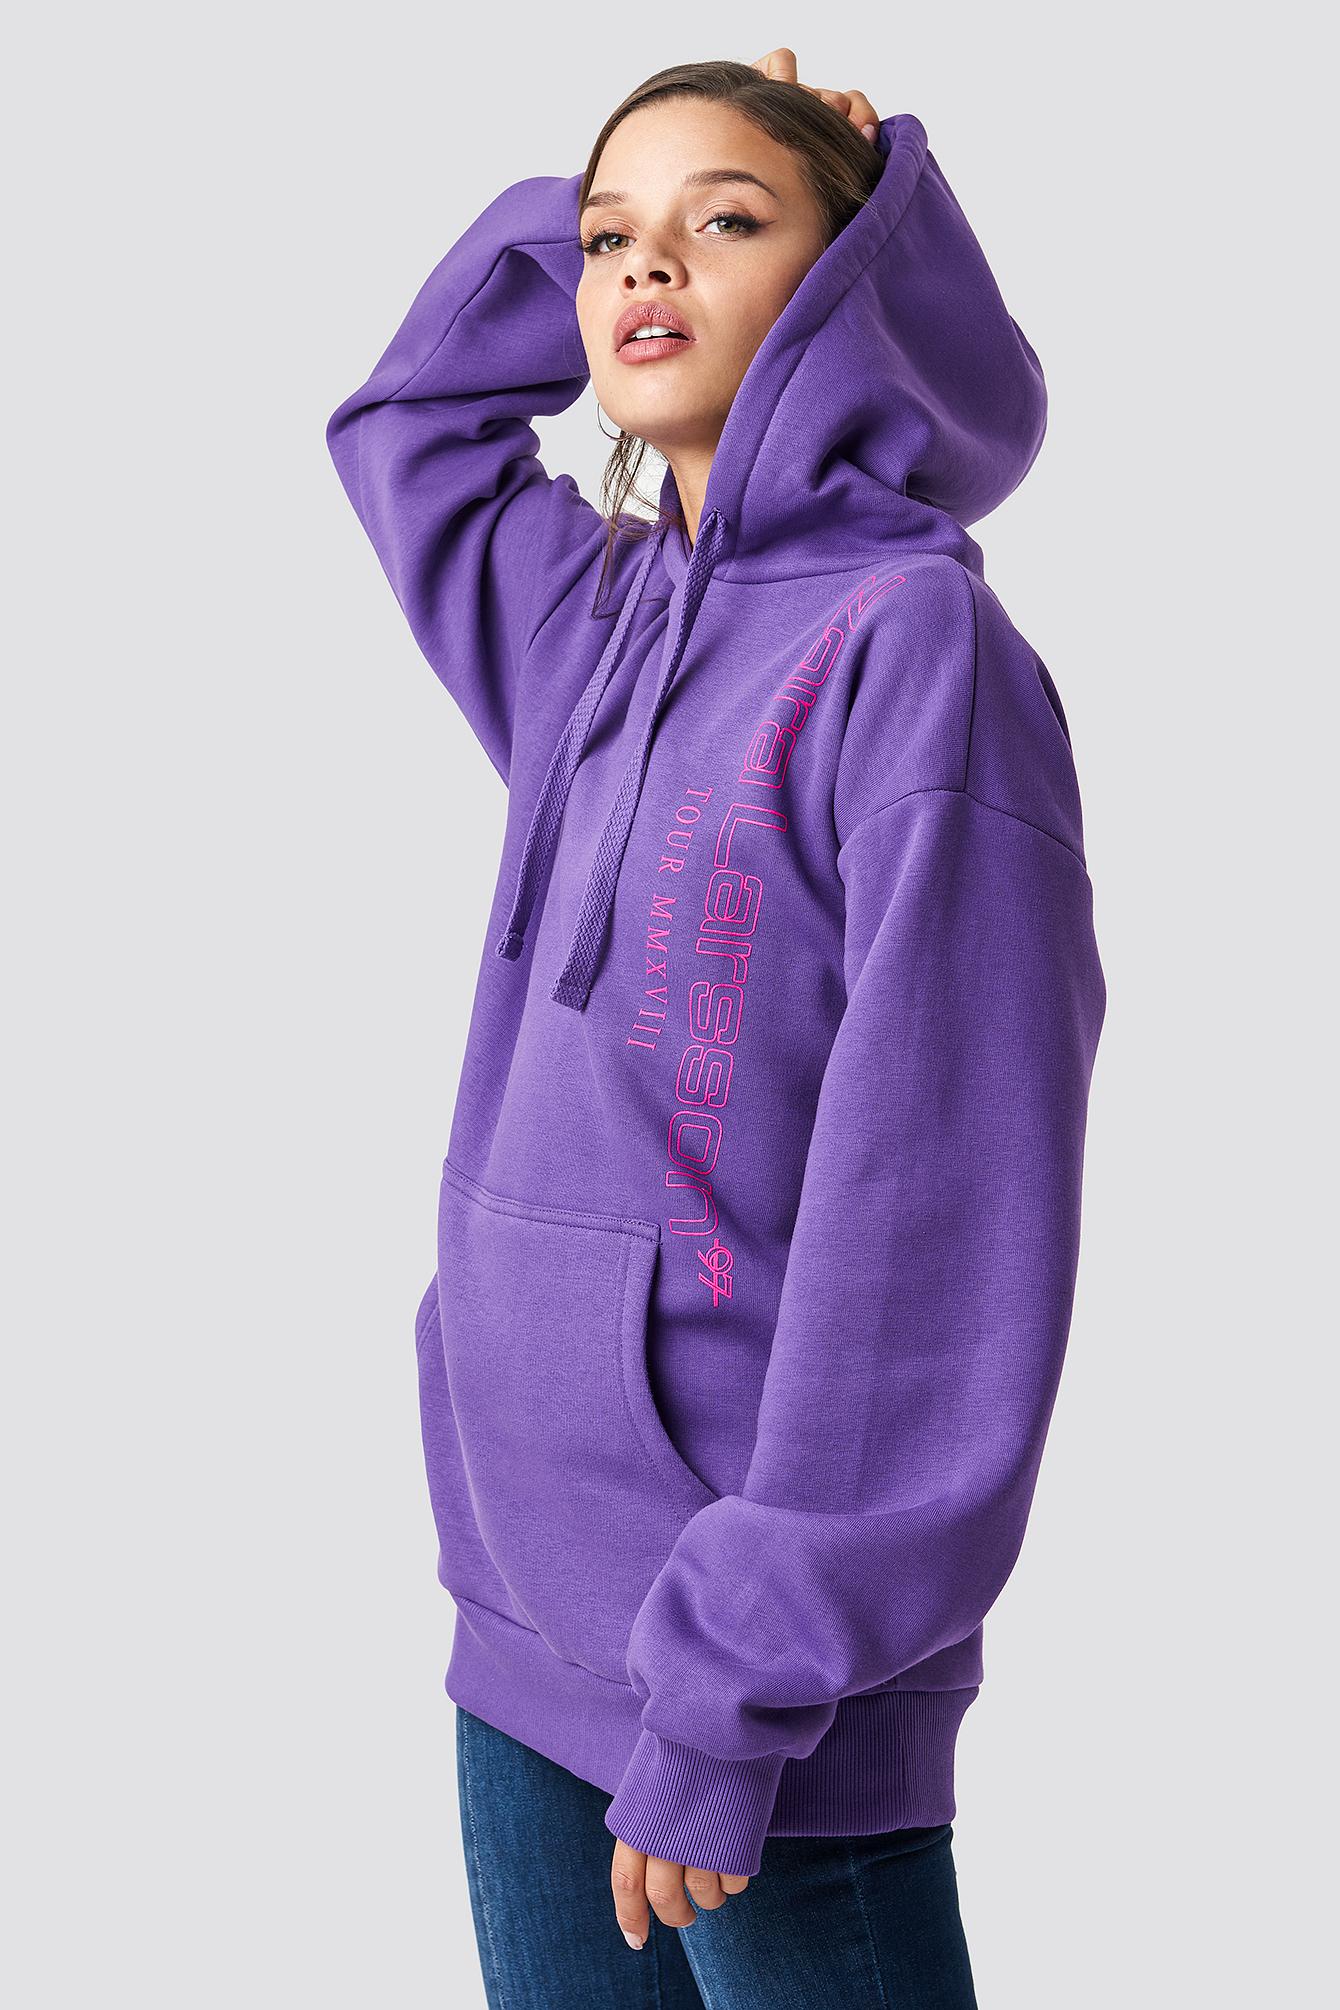 Unisex Hoodie - Purple